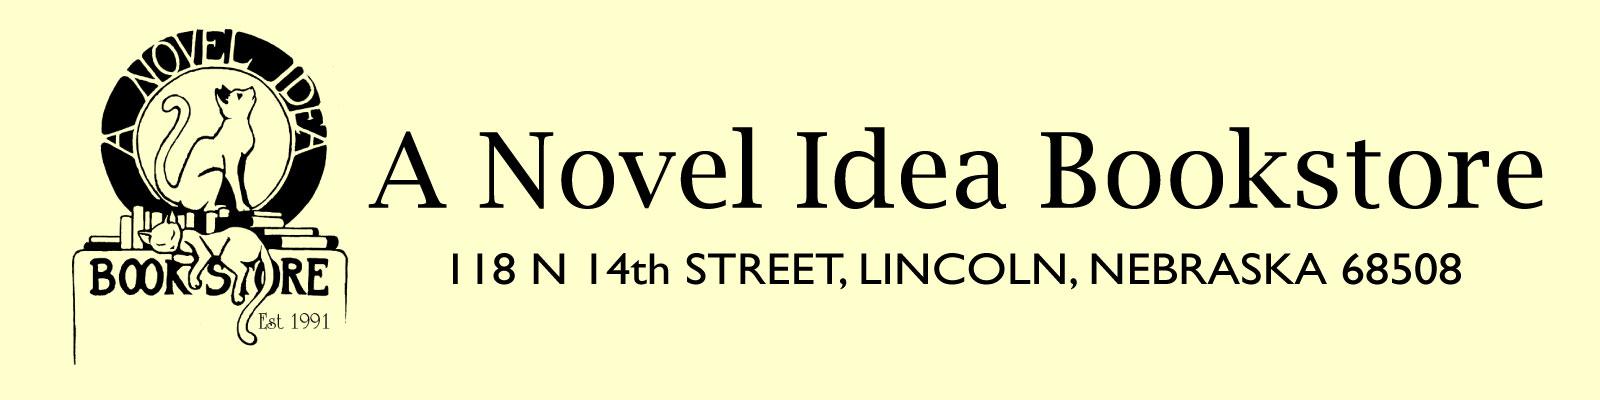 A Novel Idea Bookstore Logo